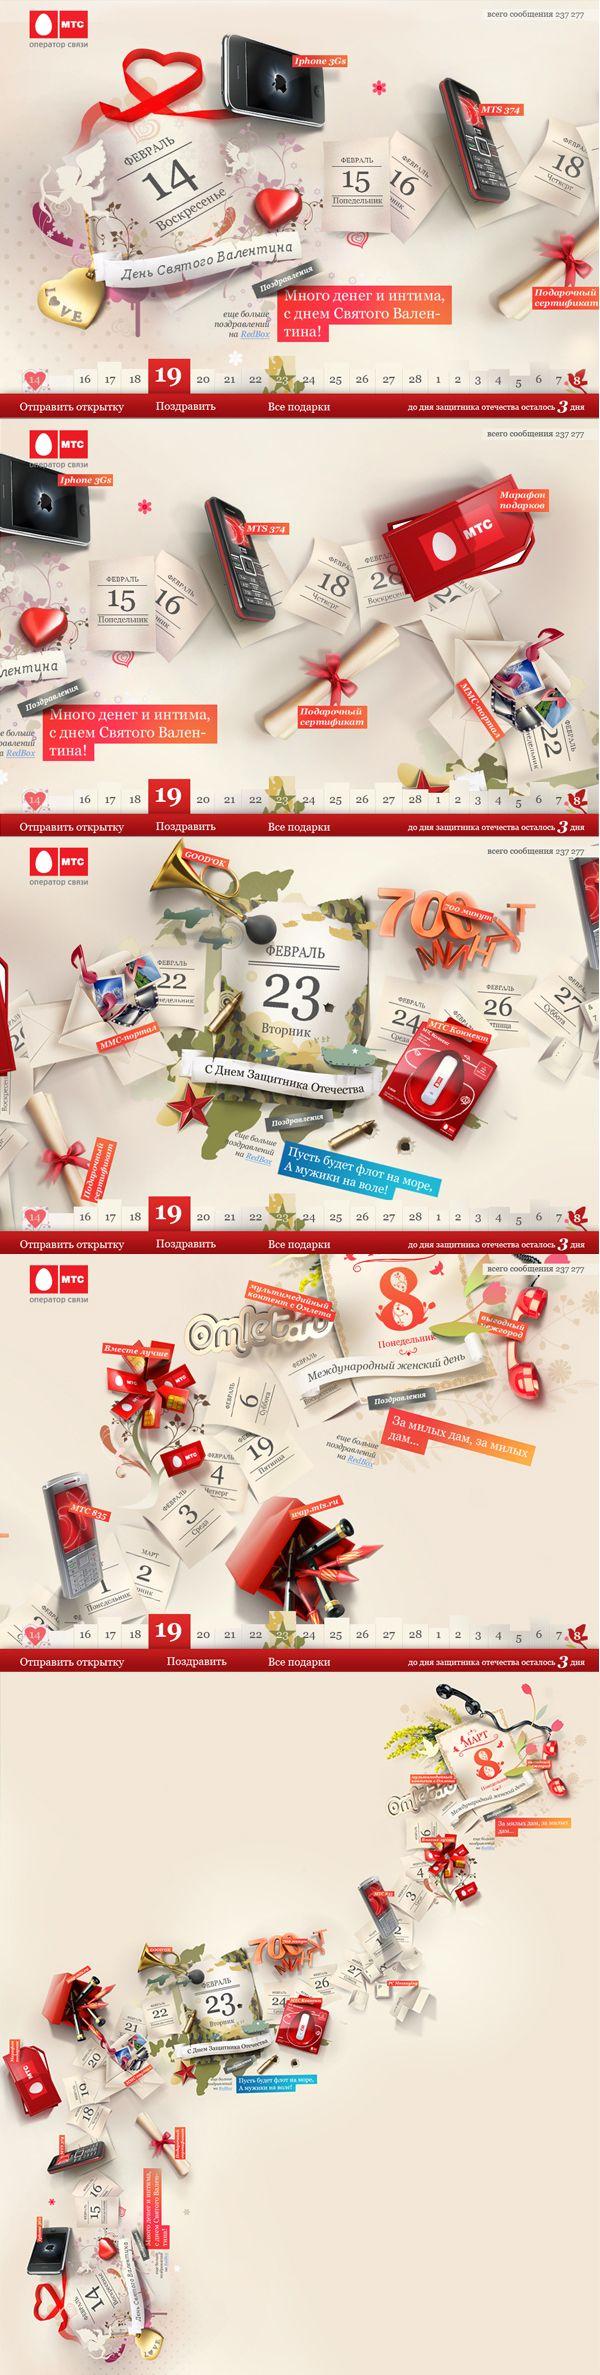 Holidays by Ruslan Latypov, via Behance